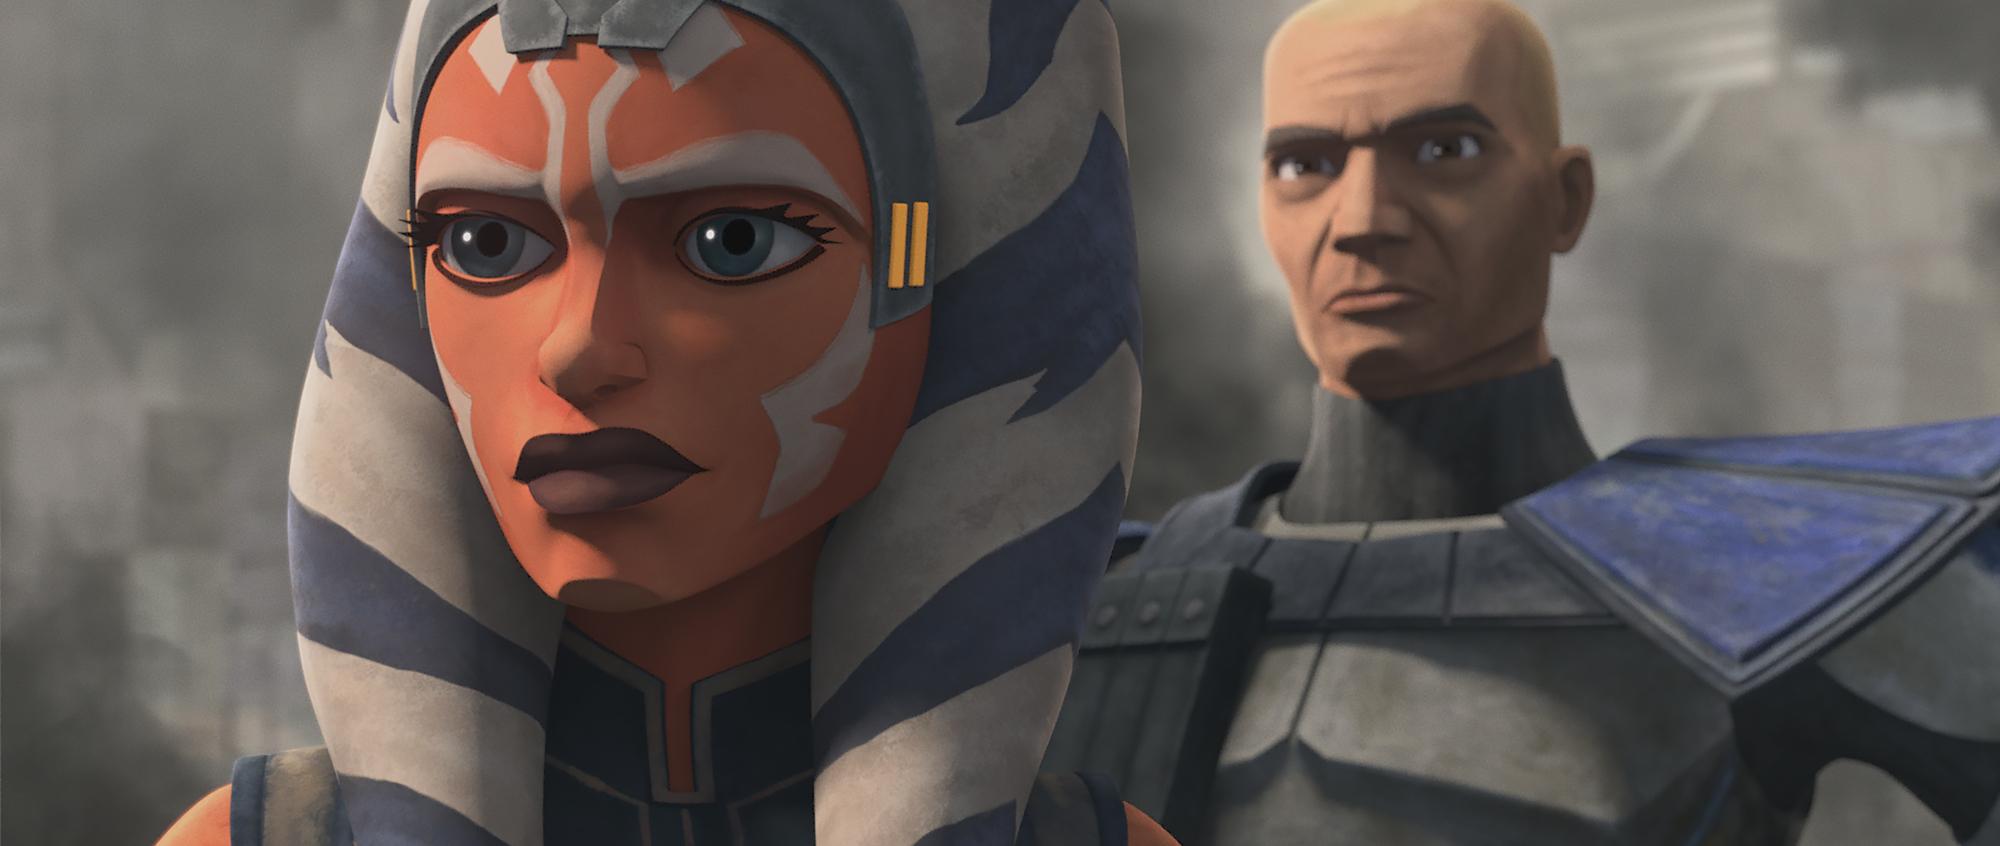 Ahsoka and Rex in Season 7, Episode 11 'The Clone Wars.'